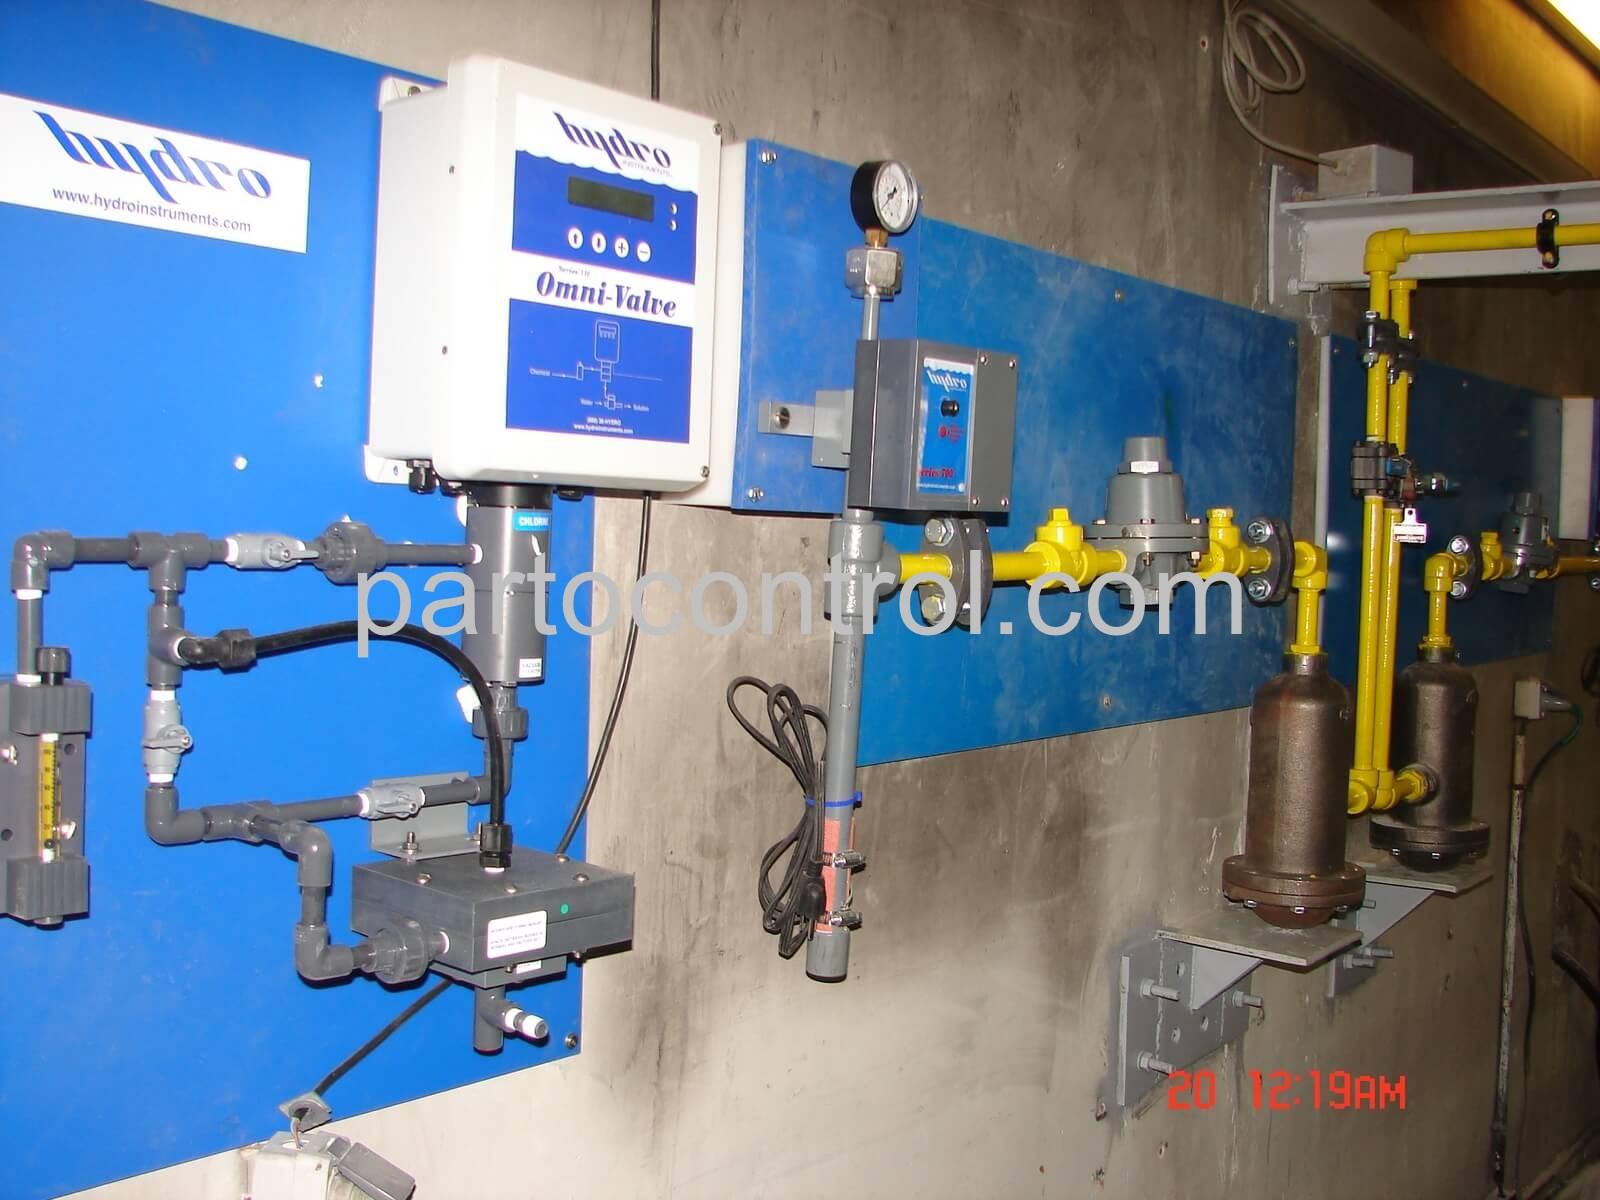 Ferdows gase chlorineکلرزن گازی فردوس1 - پروژه کلرزن گازی